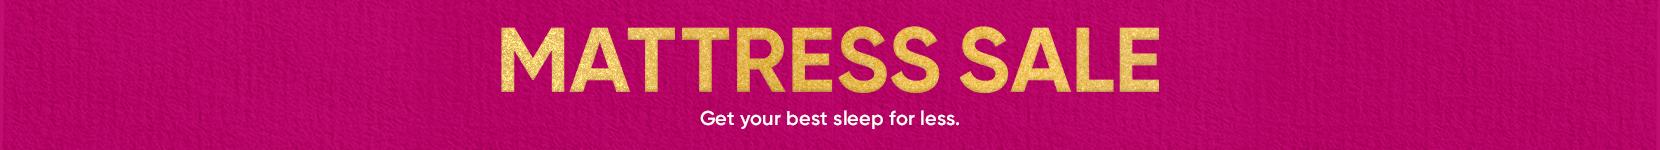 mattress sale. get your best sleep for less.